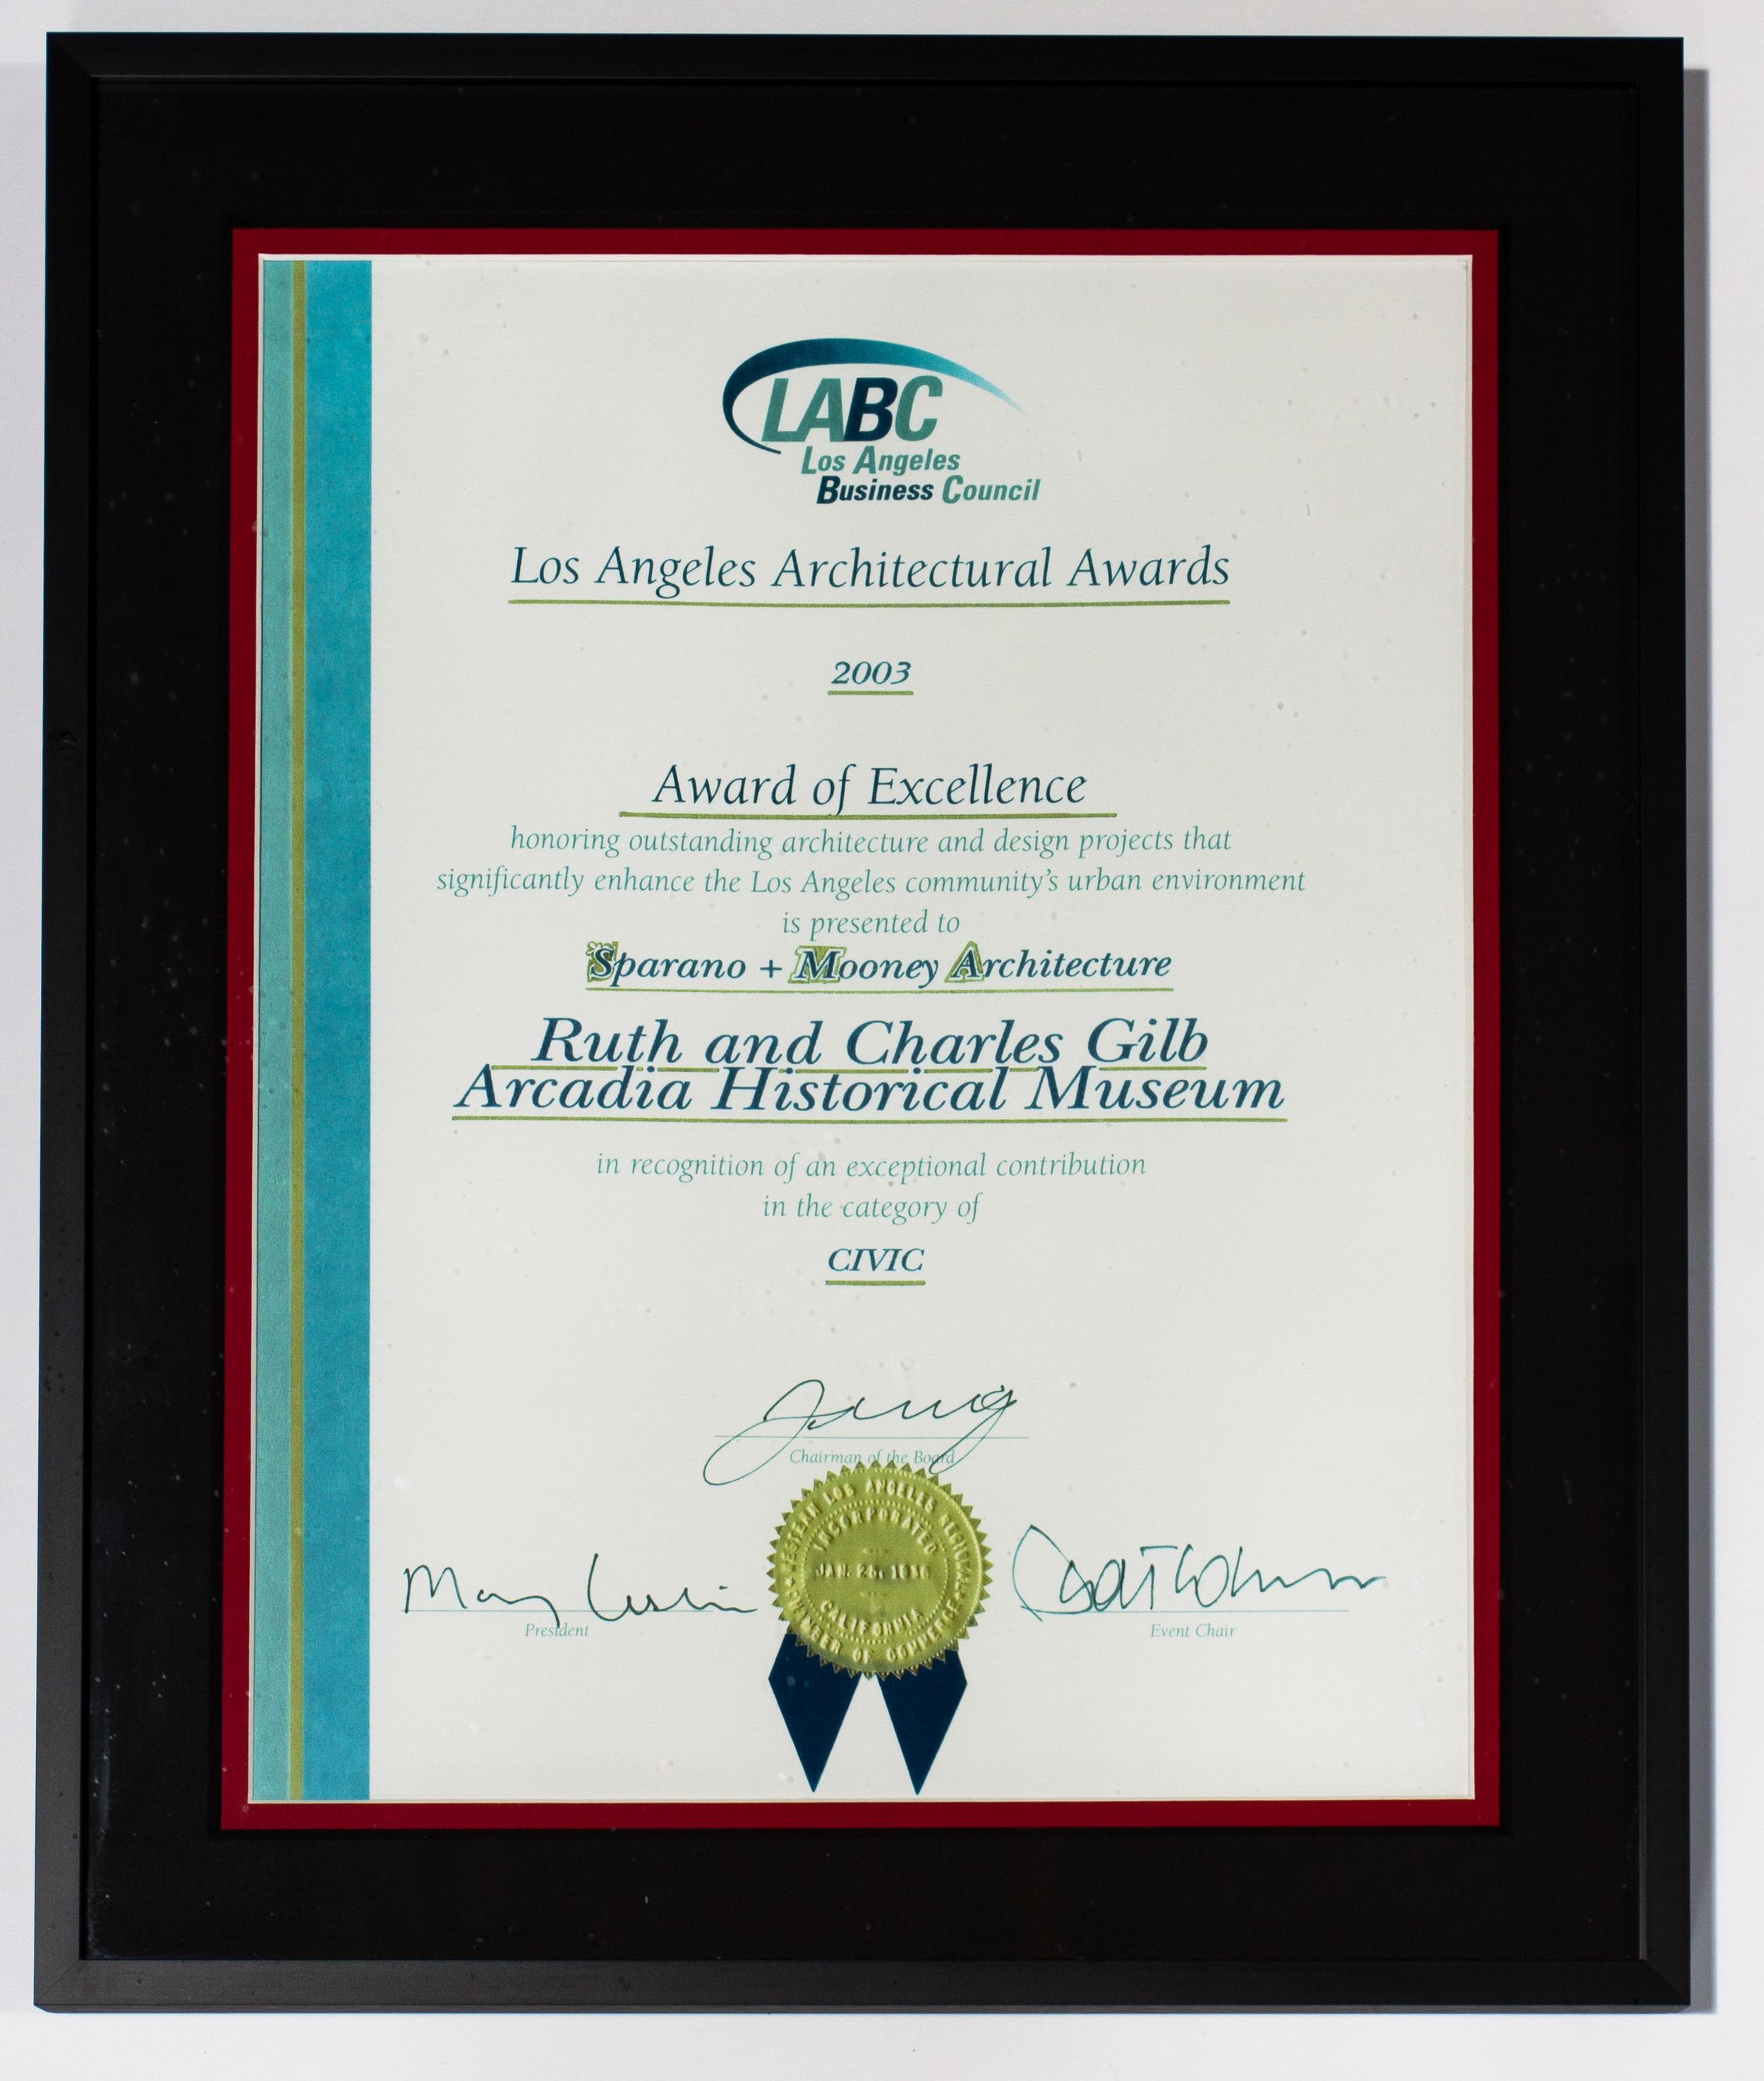 SparanoMooneyArchitecture_Award(07)